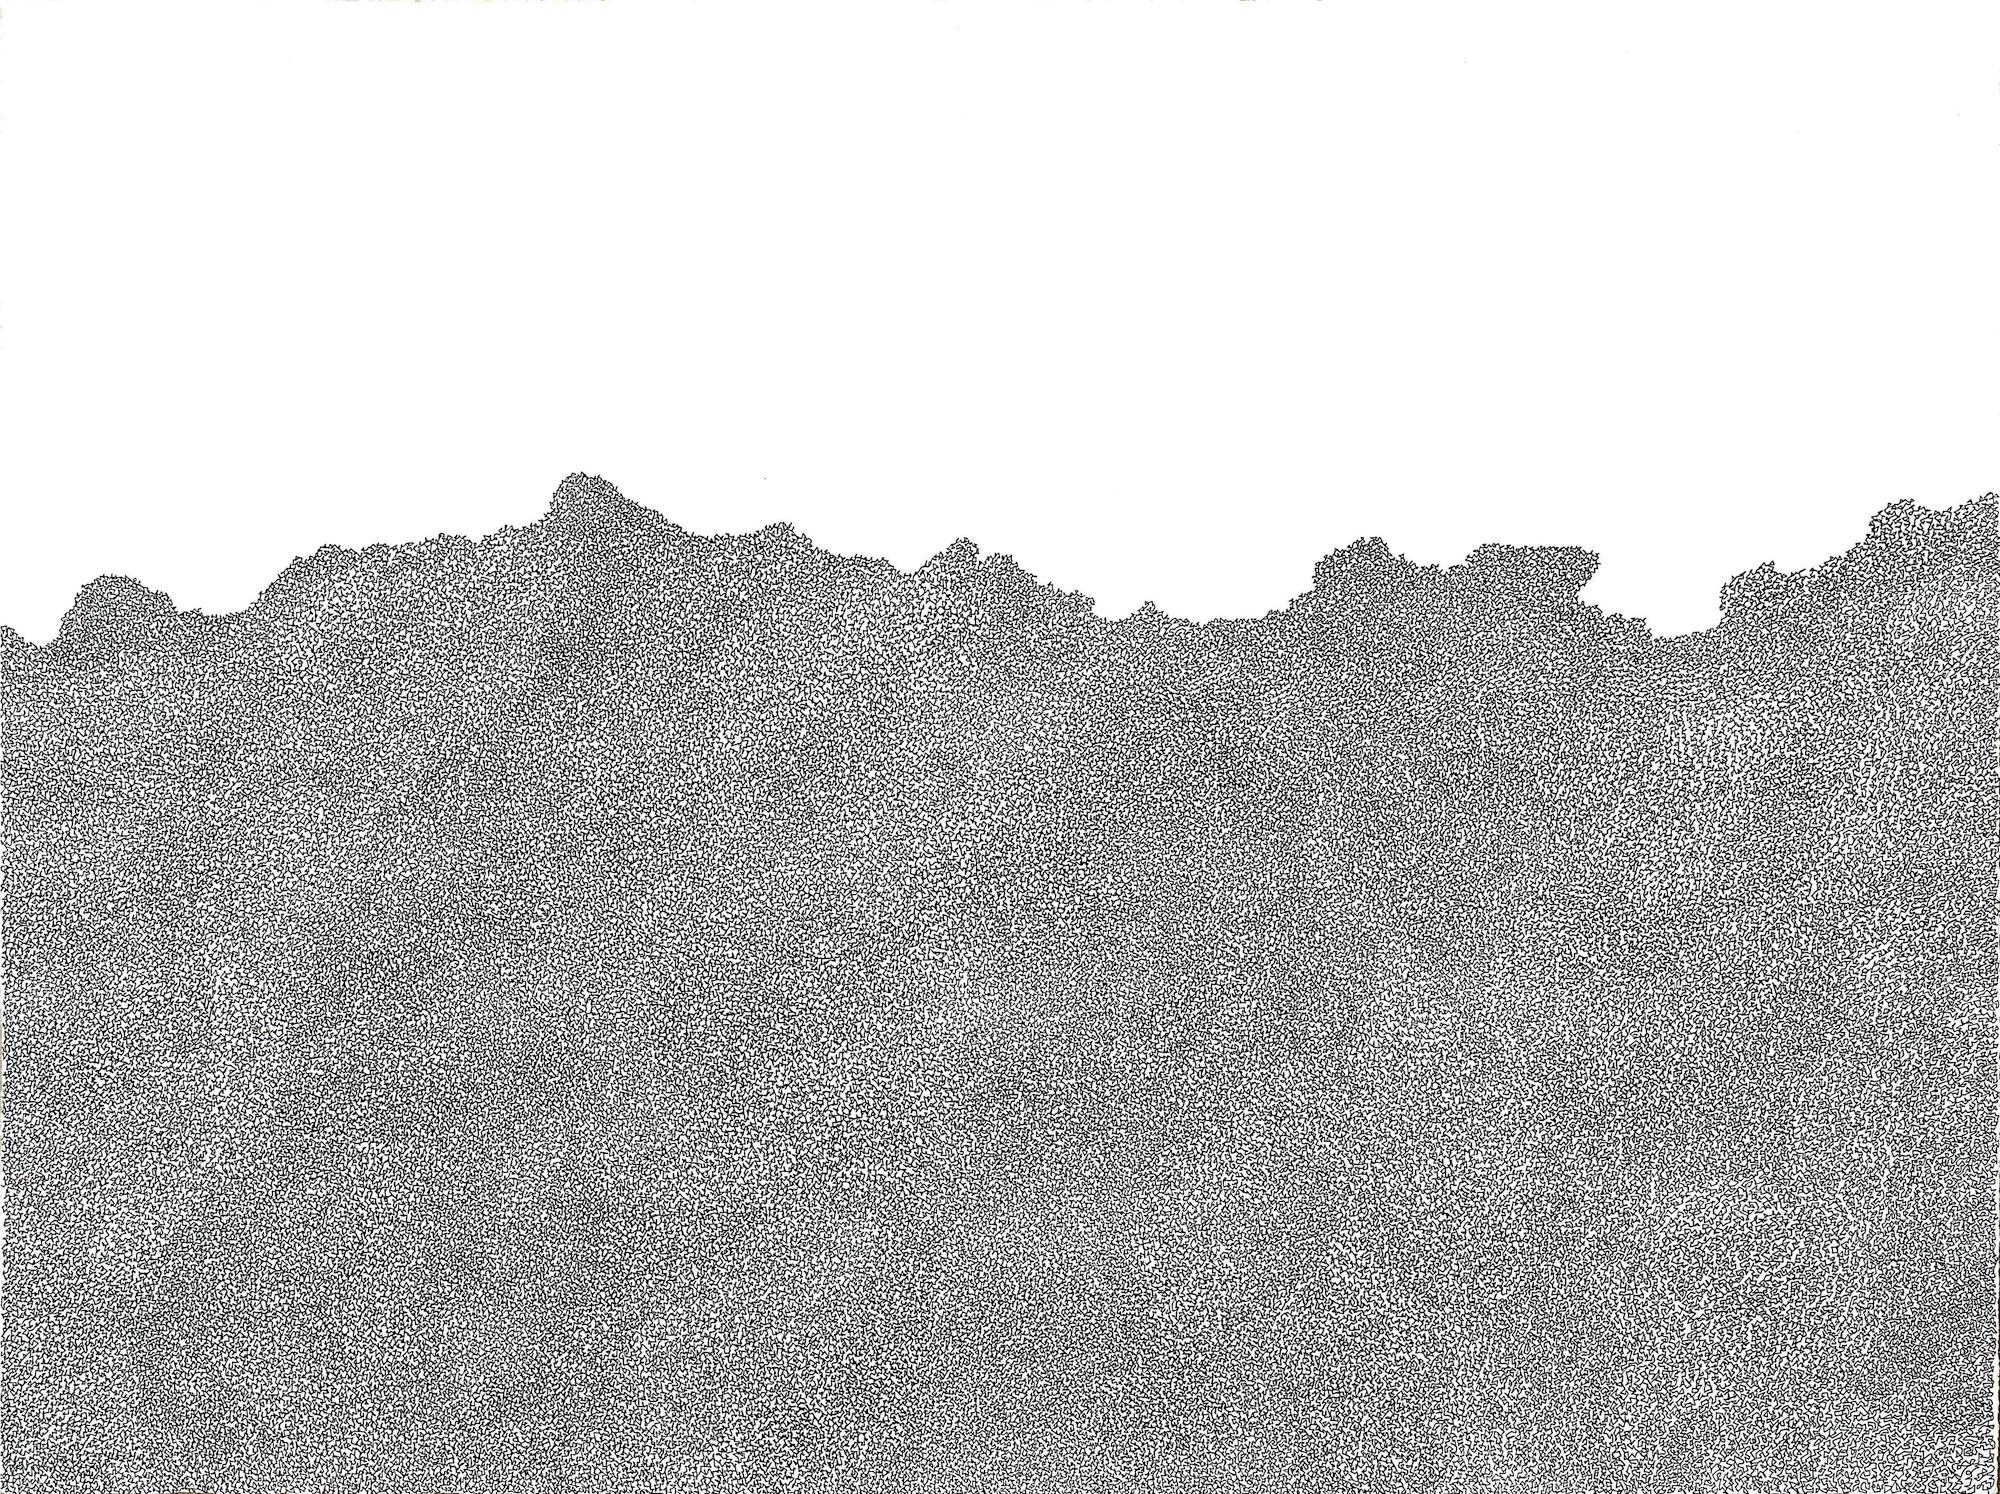 One thread 2012 Felt tip pen on paper 56.5 cm x 76 cm